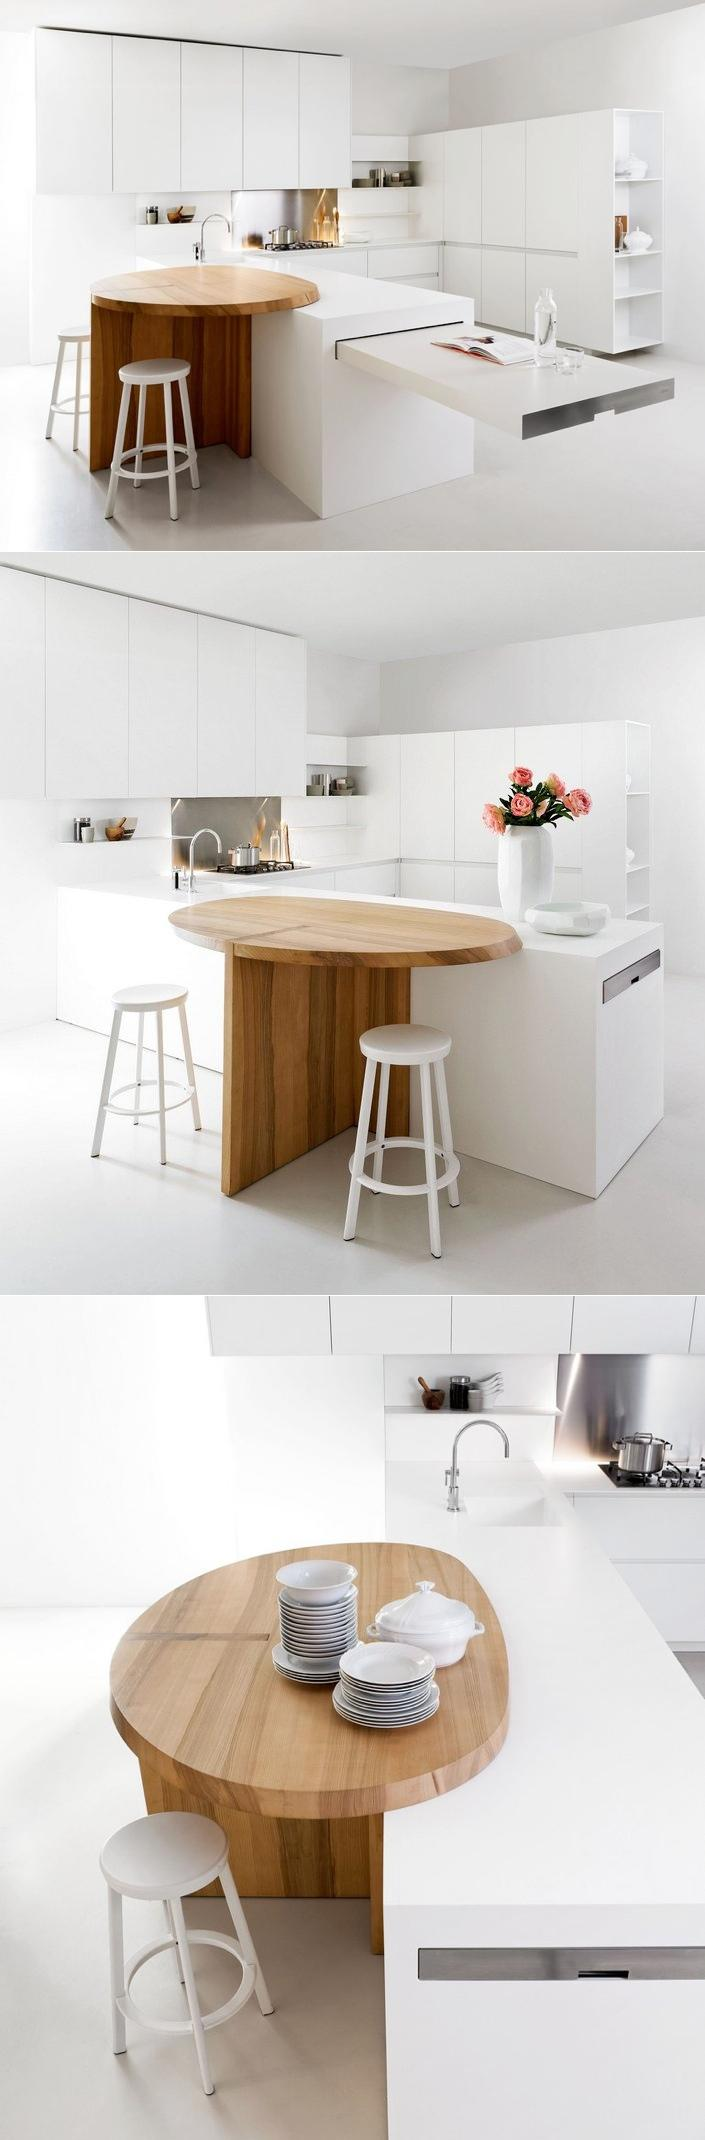 Pin de Artur Zverev en для Кухни | Pinterest